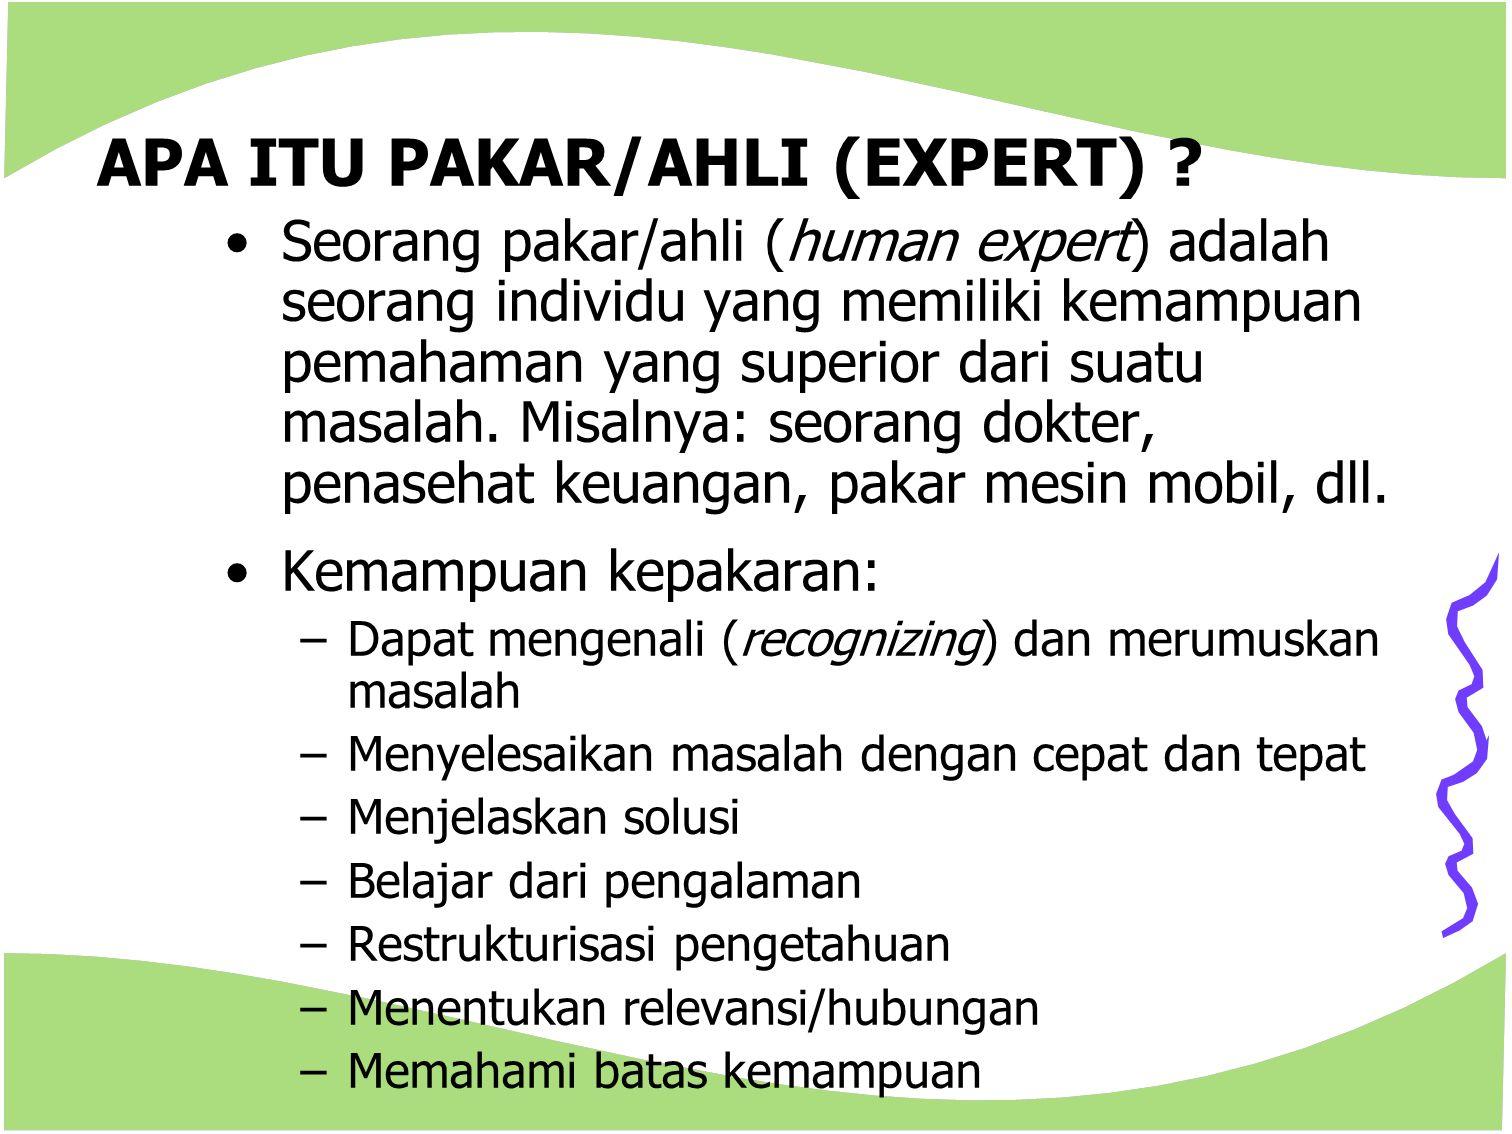 APA ITU PAKAR/AHLI (EXPERT)